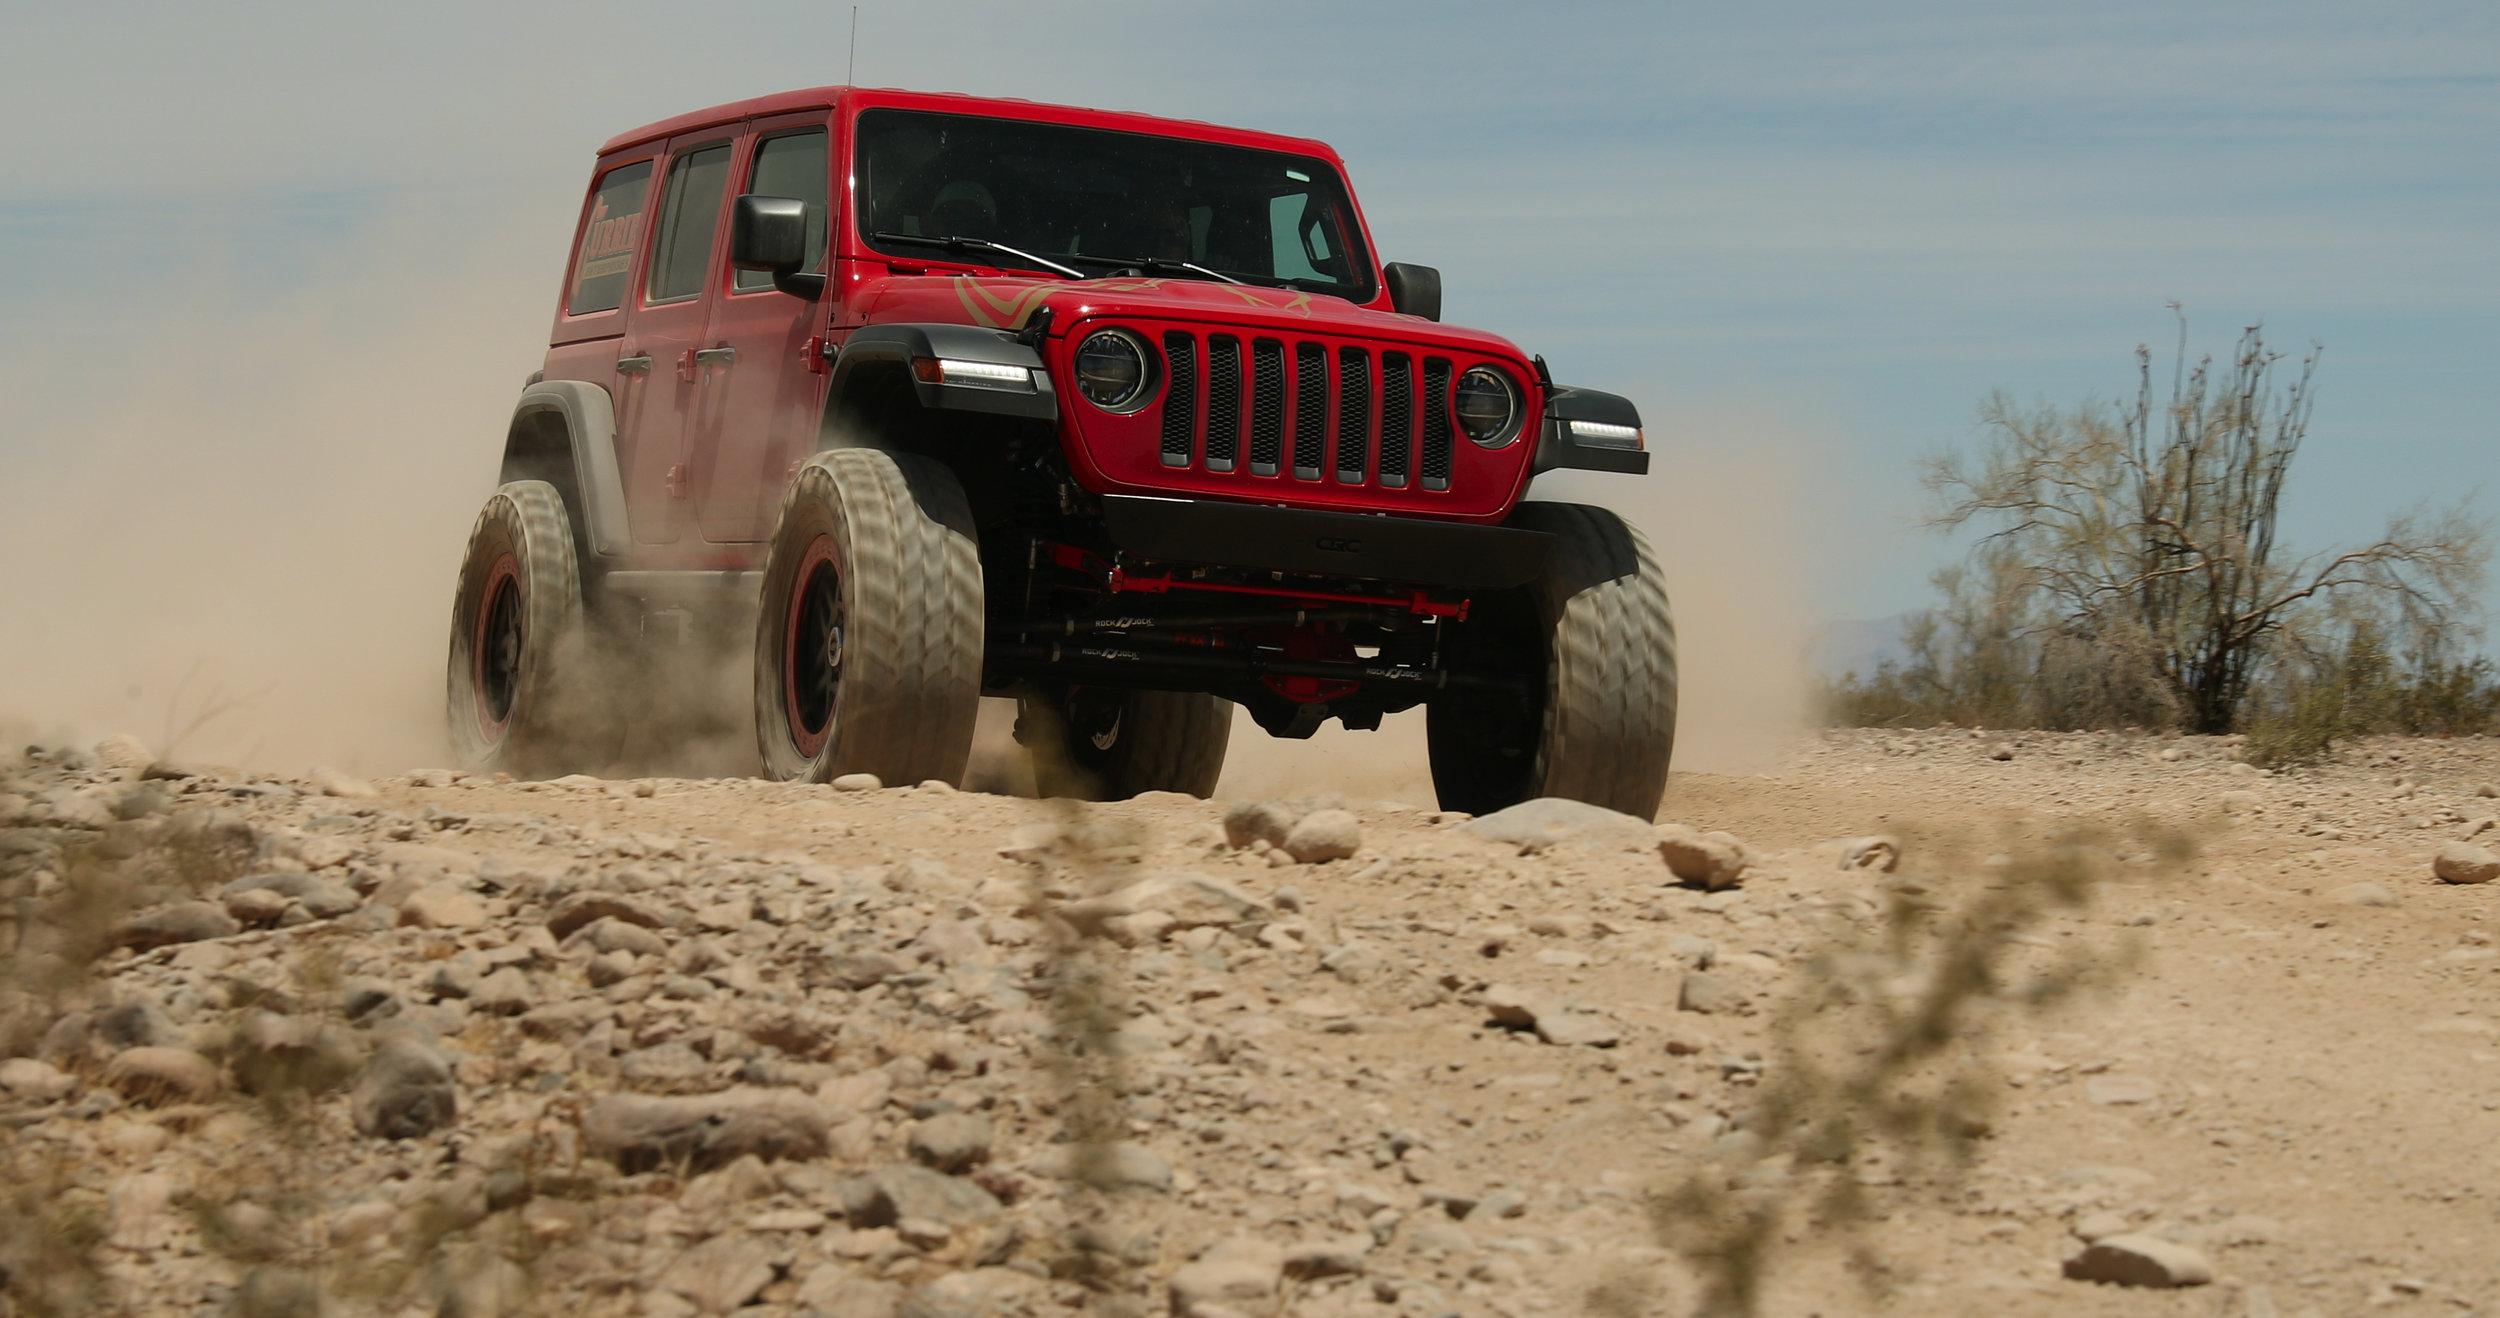 6_24_CaseyCurrie_Baja500PreRunning_BajaMexico_Jeep_015.jpg